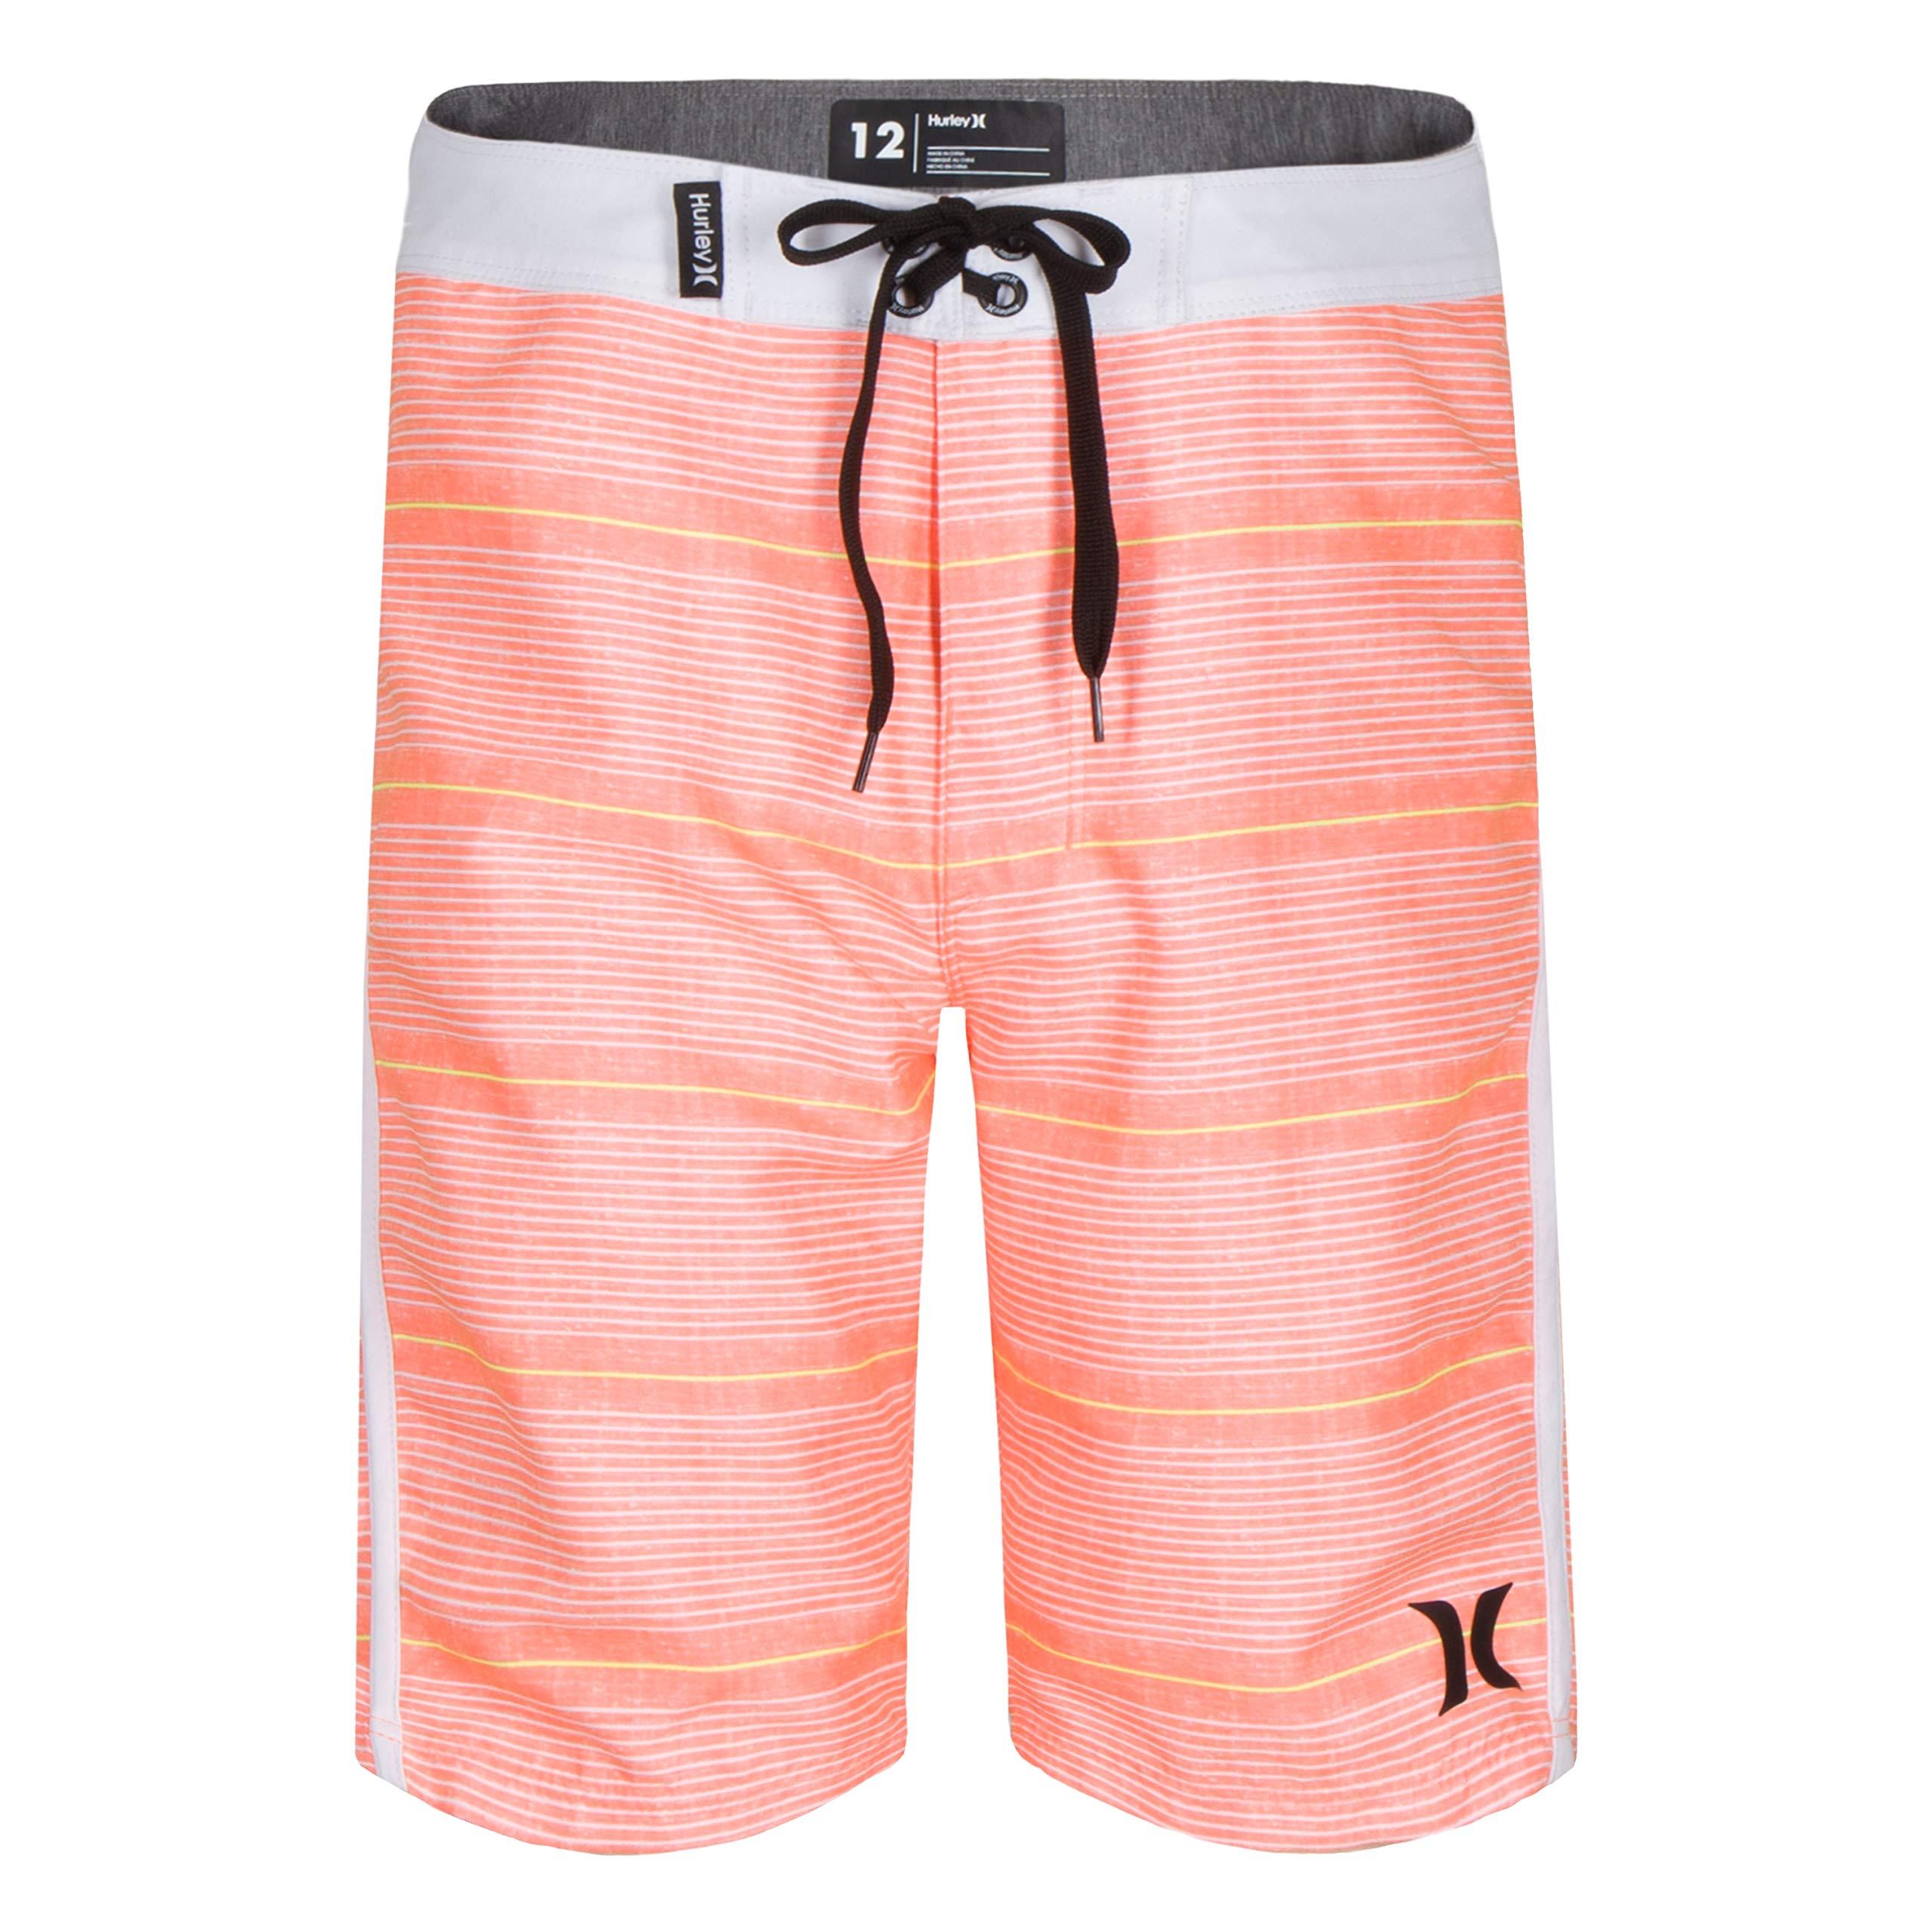 Hurley Big Boys' Board Shorts, Bright Mango, 18